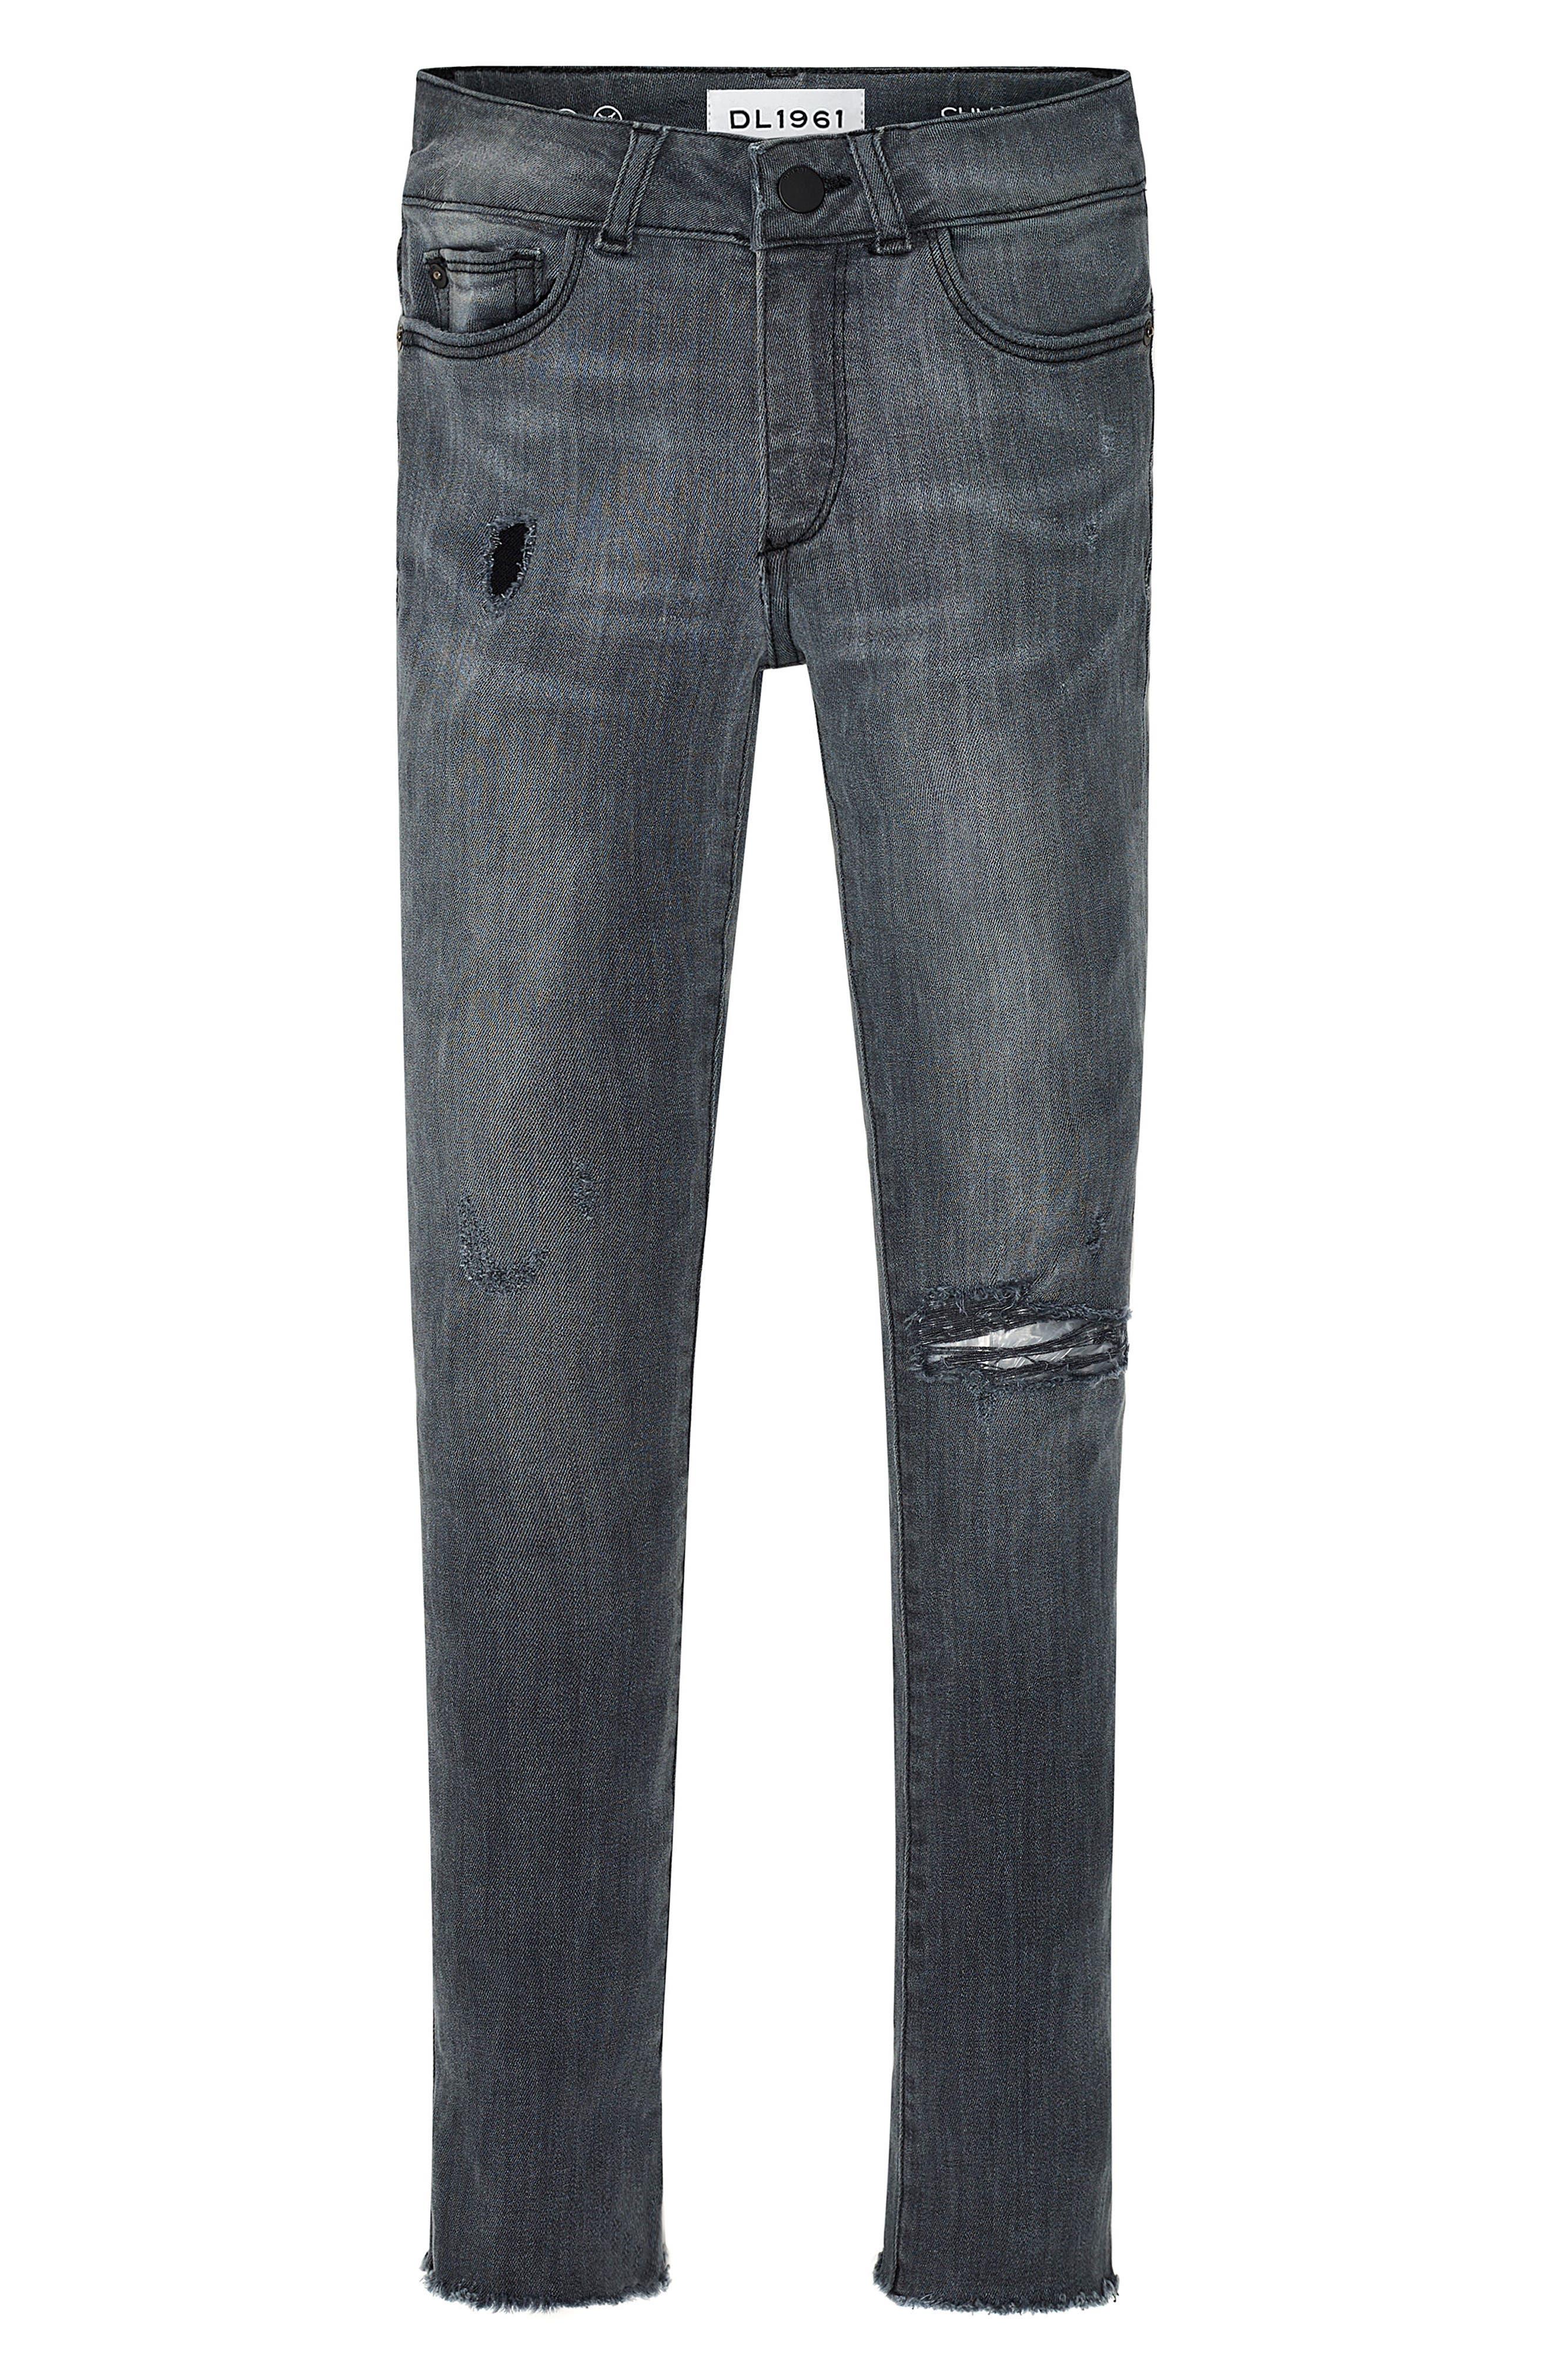 DL1961 Chloe Raw Hem Skinny Jeans (Big Girls)